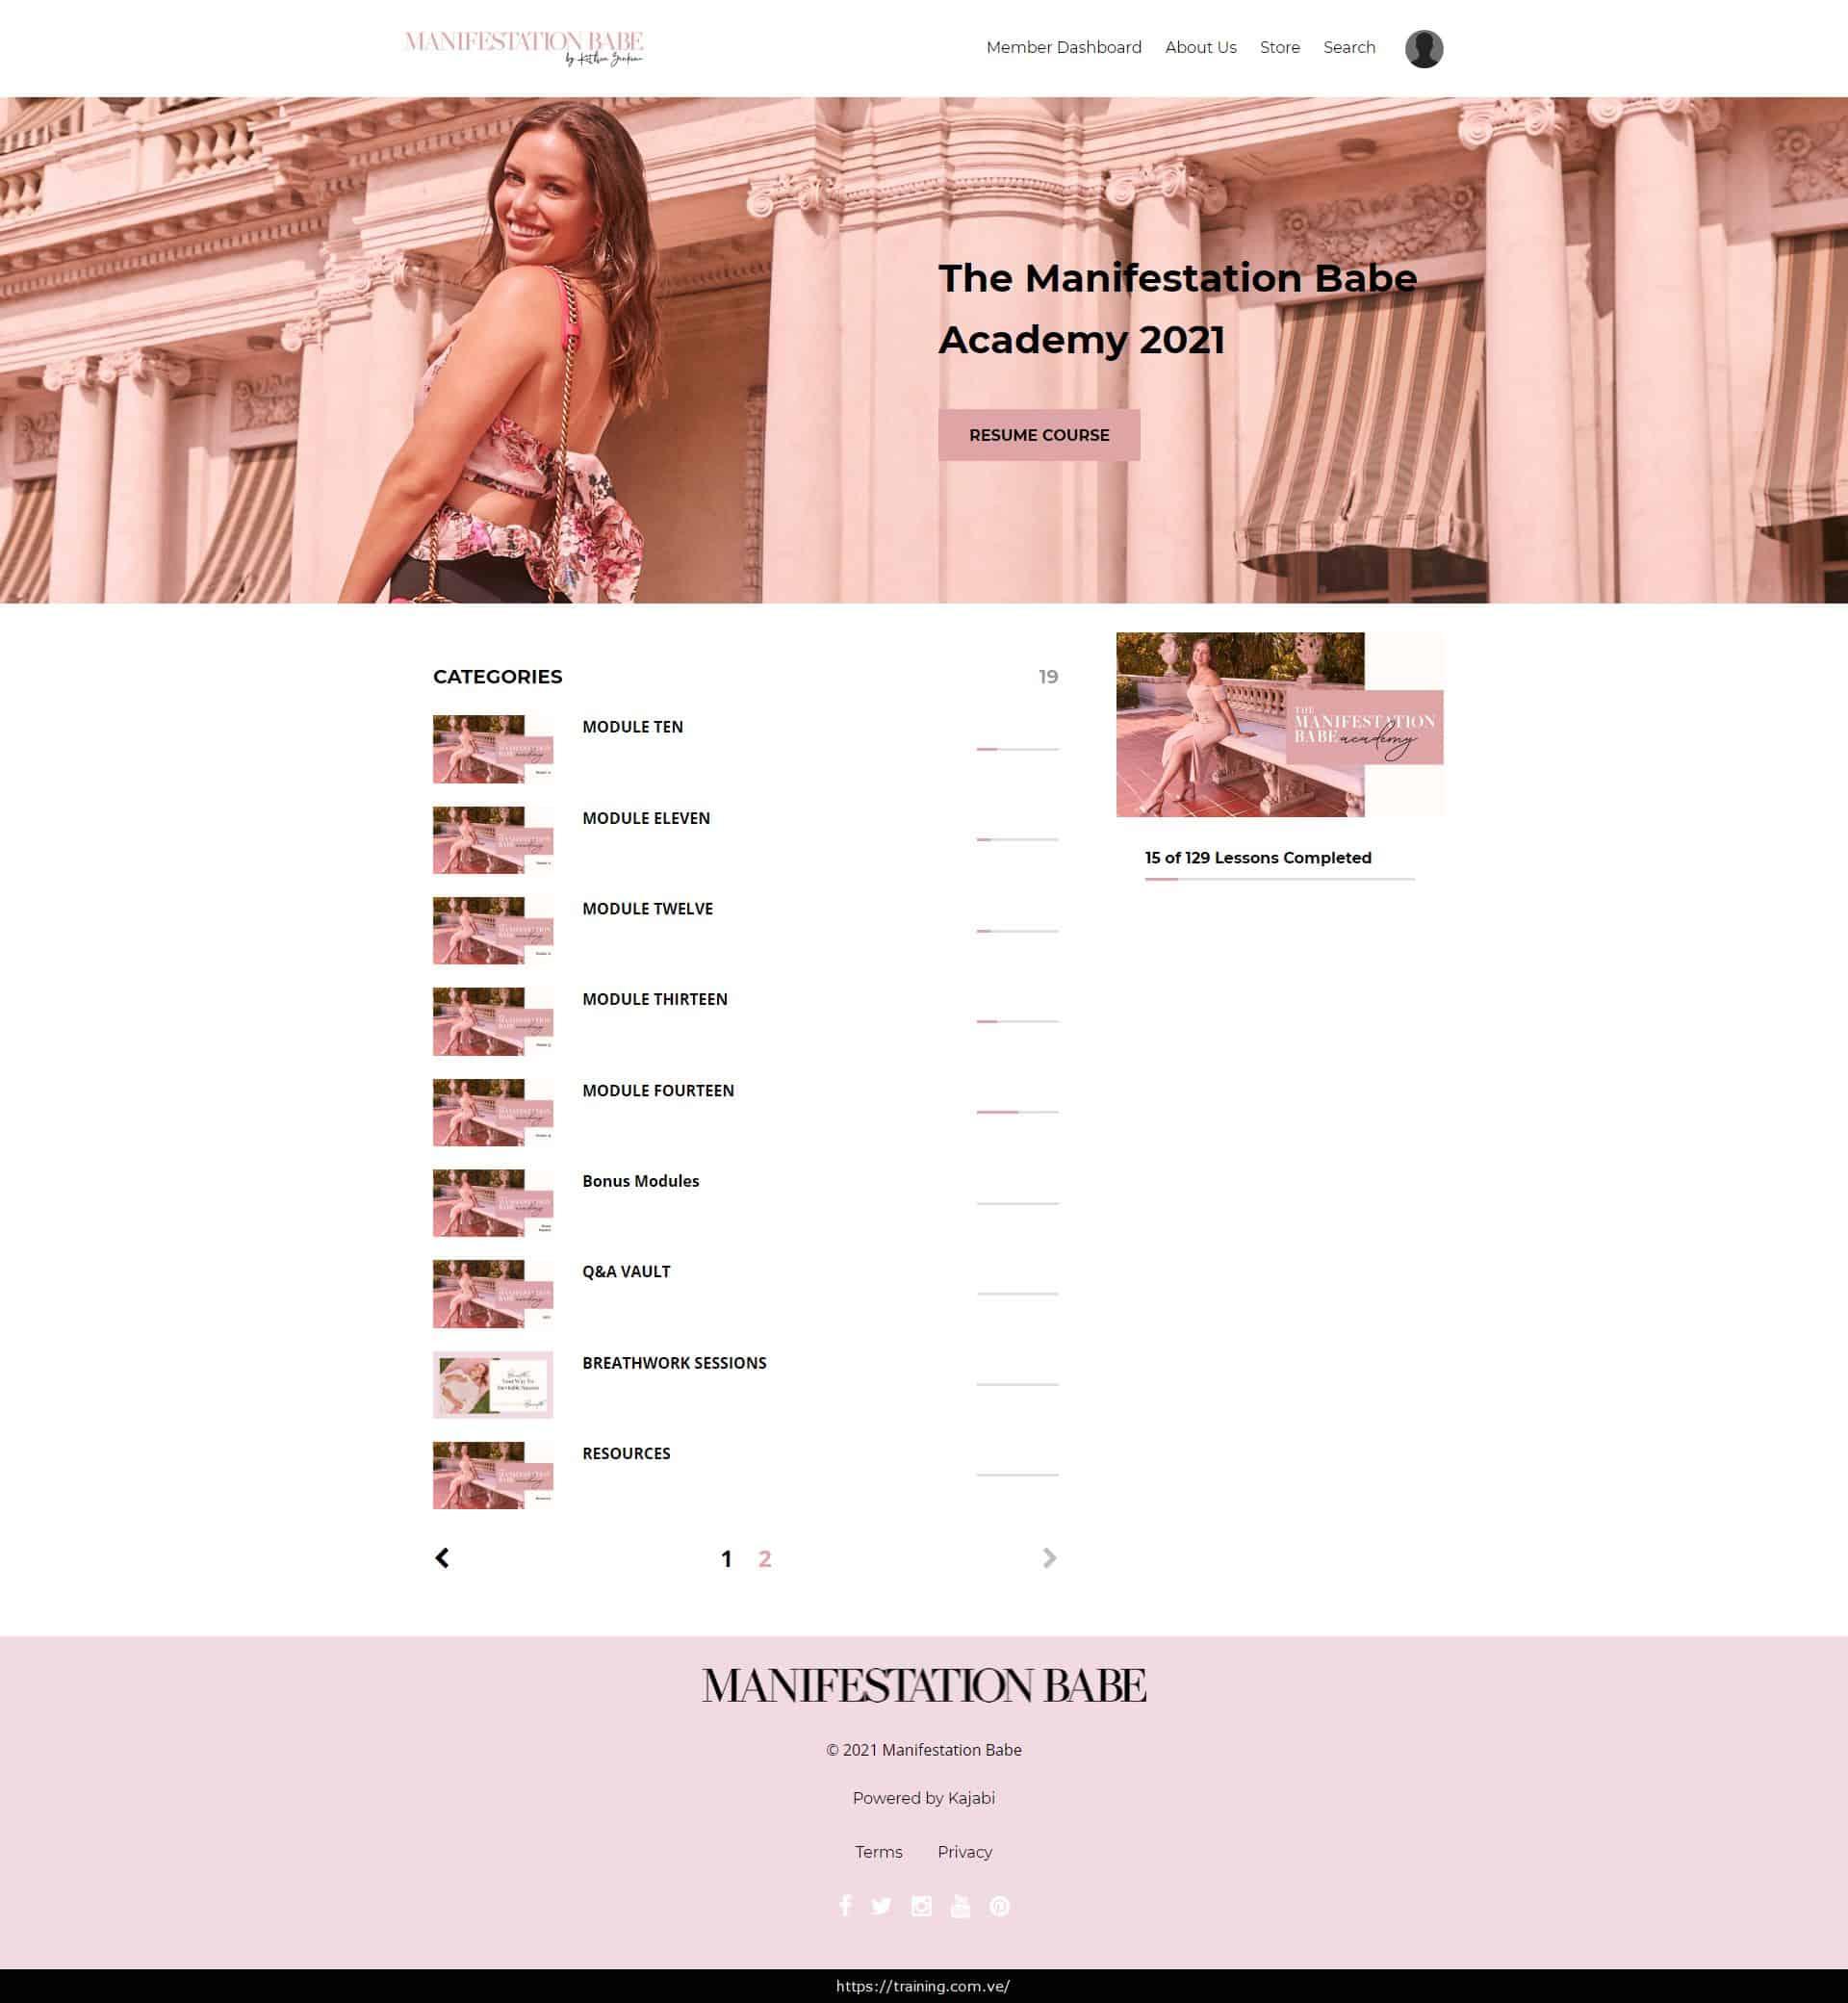 Download Manifestation Babe Academy 2021 by Kathrin Zenkina